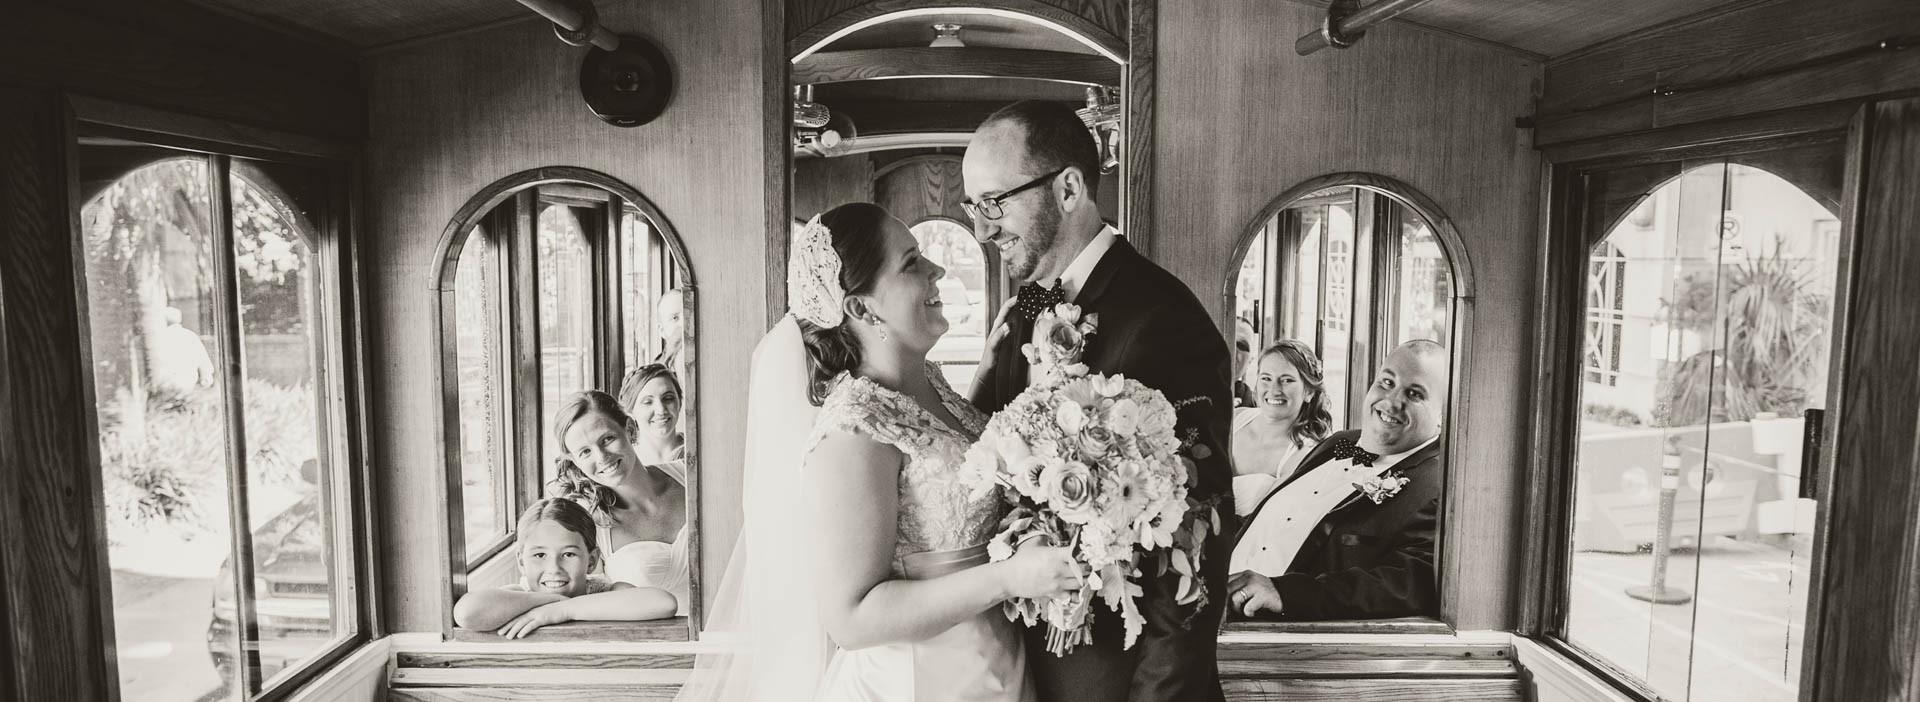 Charleston Hotel Wedding Photographer